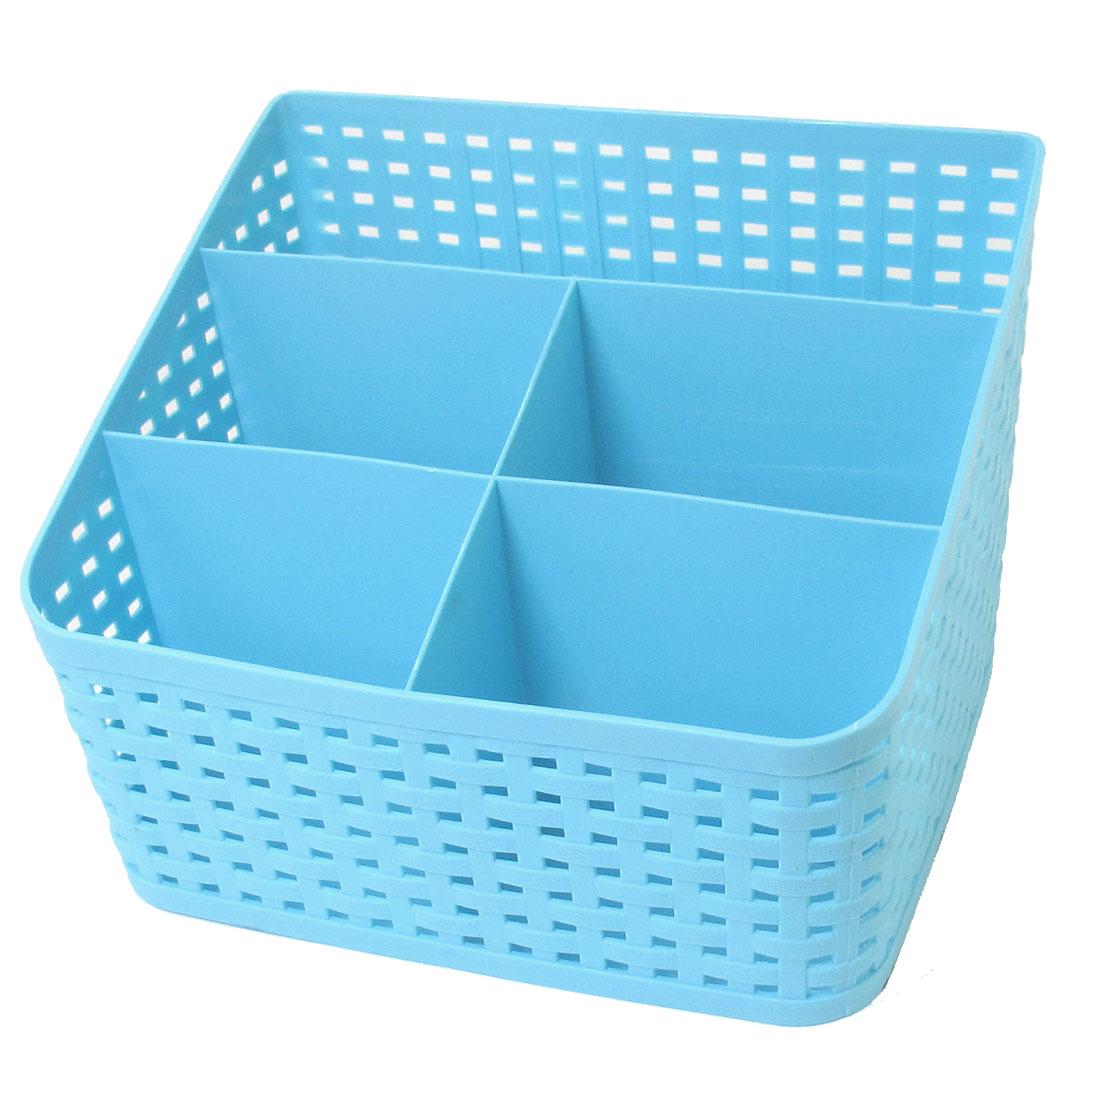 Tie Bra Socks Plastic Desktop Storage Drawer Divider Basket Box Blue